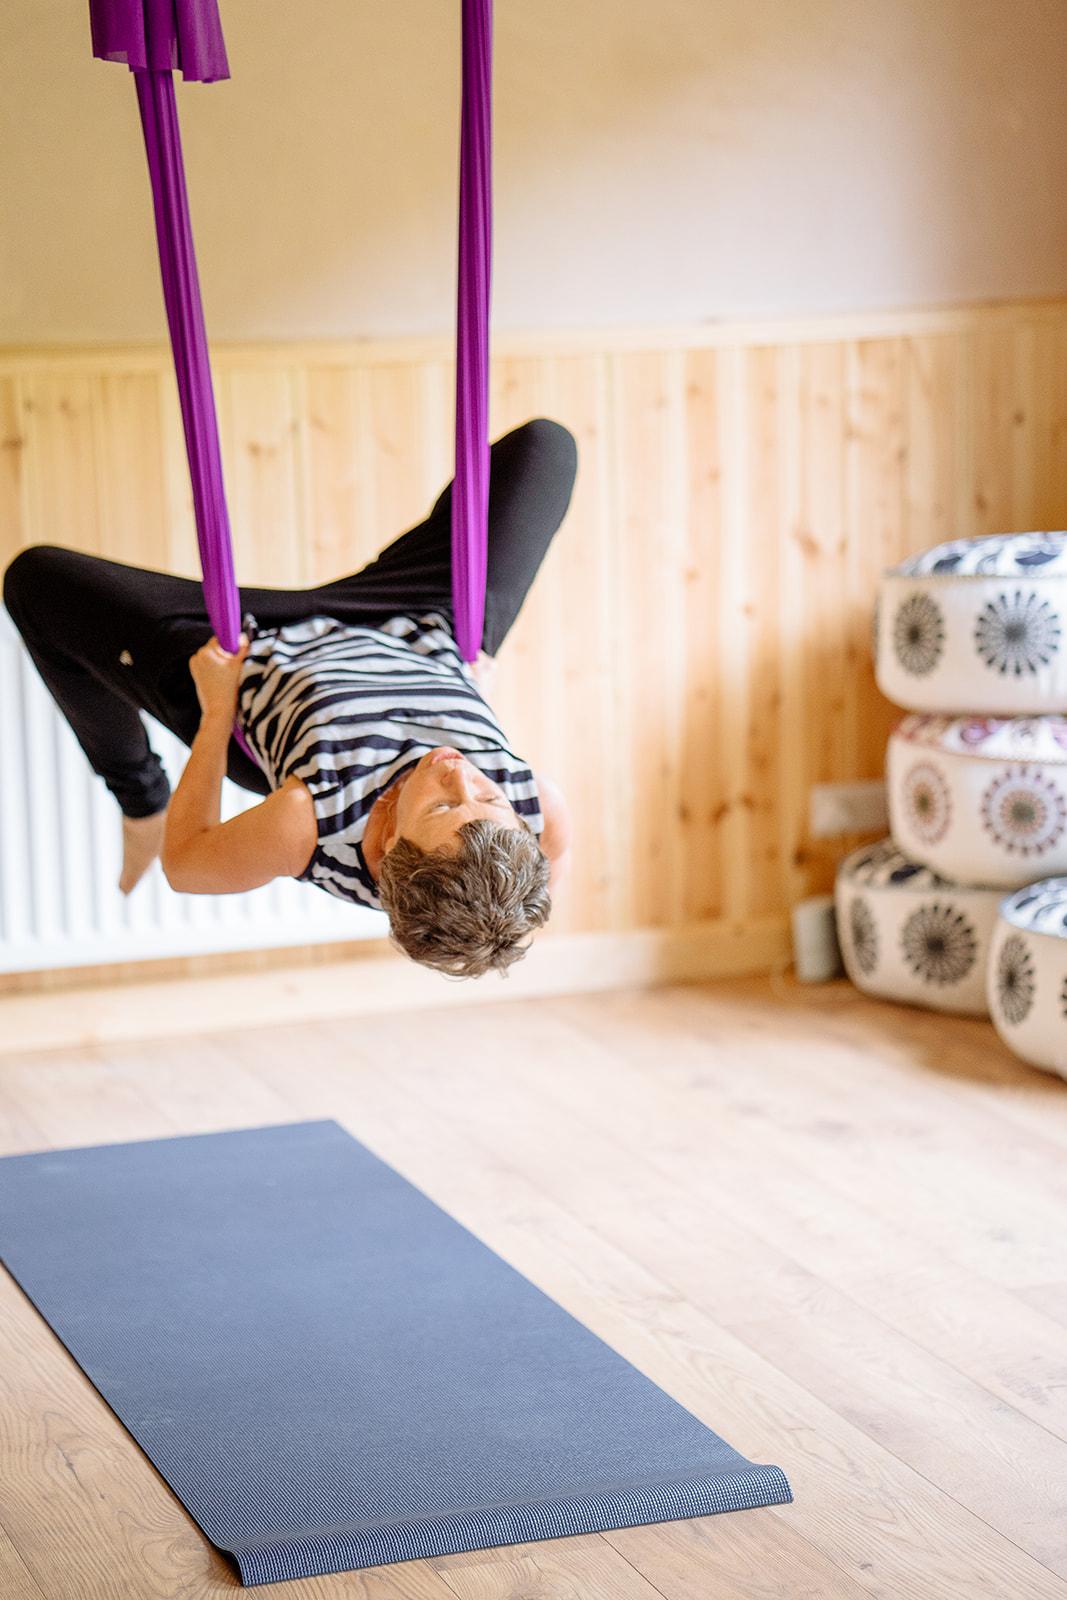 Lorraine doing an aerial yoga pose.